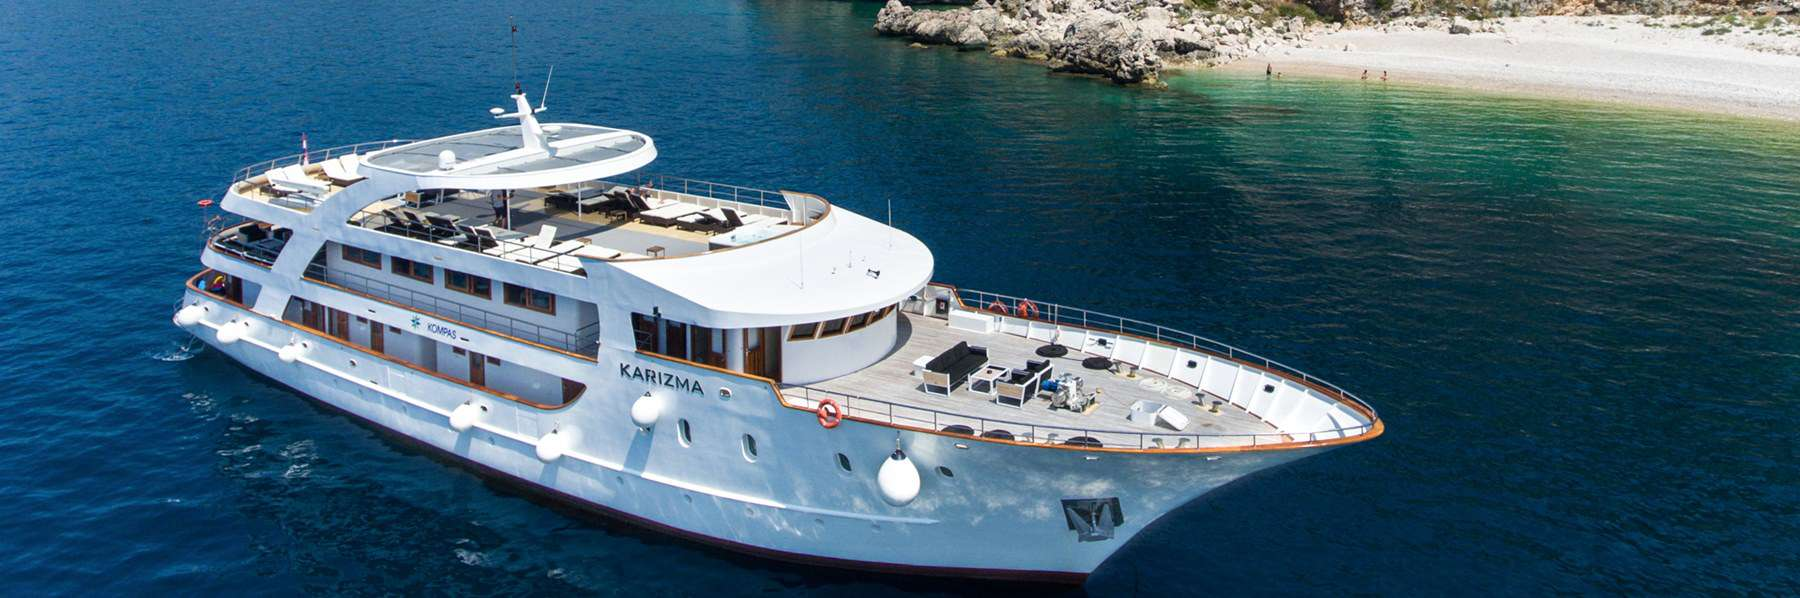 Karizma, Cruise Ship, Croatia